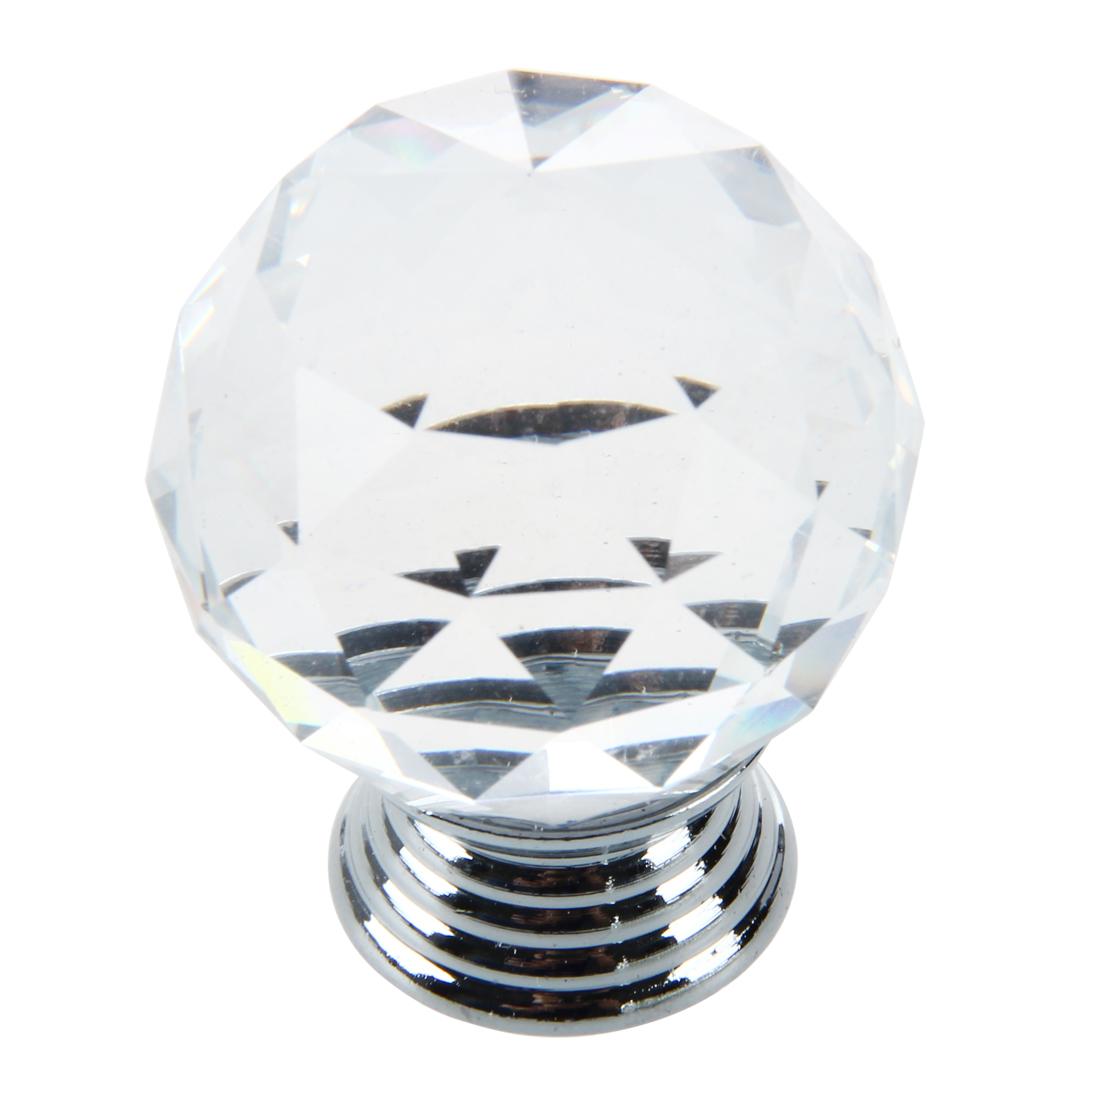 crystal glass door knobs photo - 19